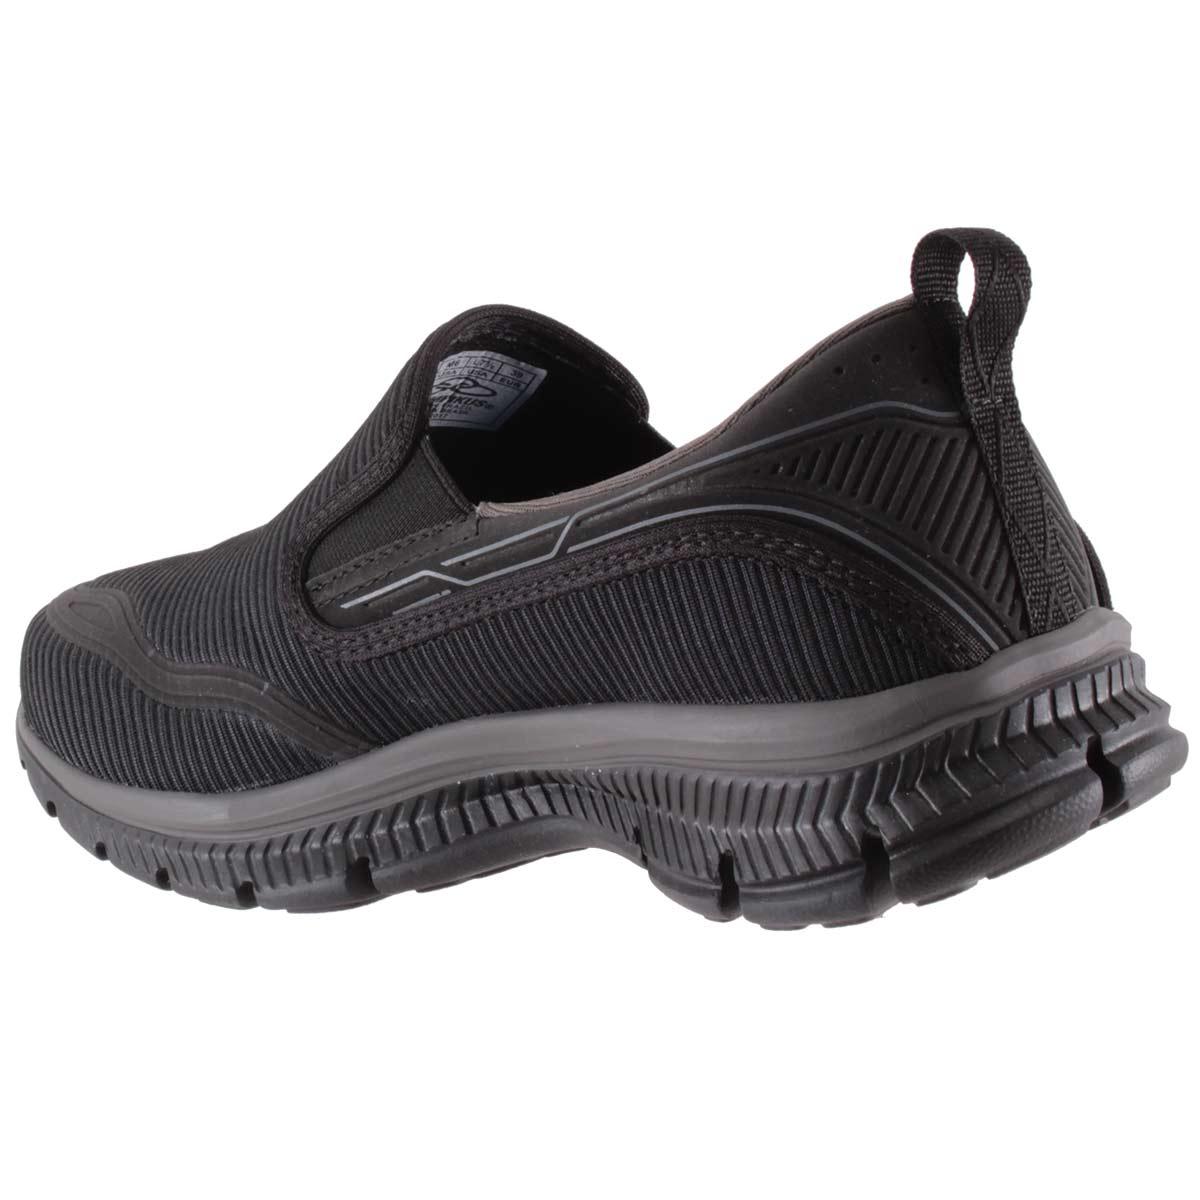 Tênis Olympikus Wellness Masculino Iate Slip On Caminhada Leve 322  - Ian Calçados